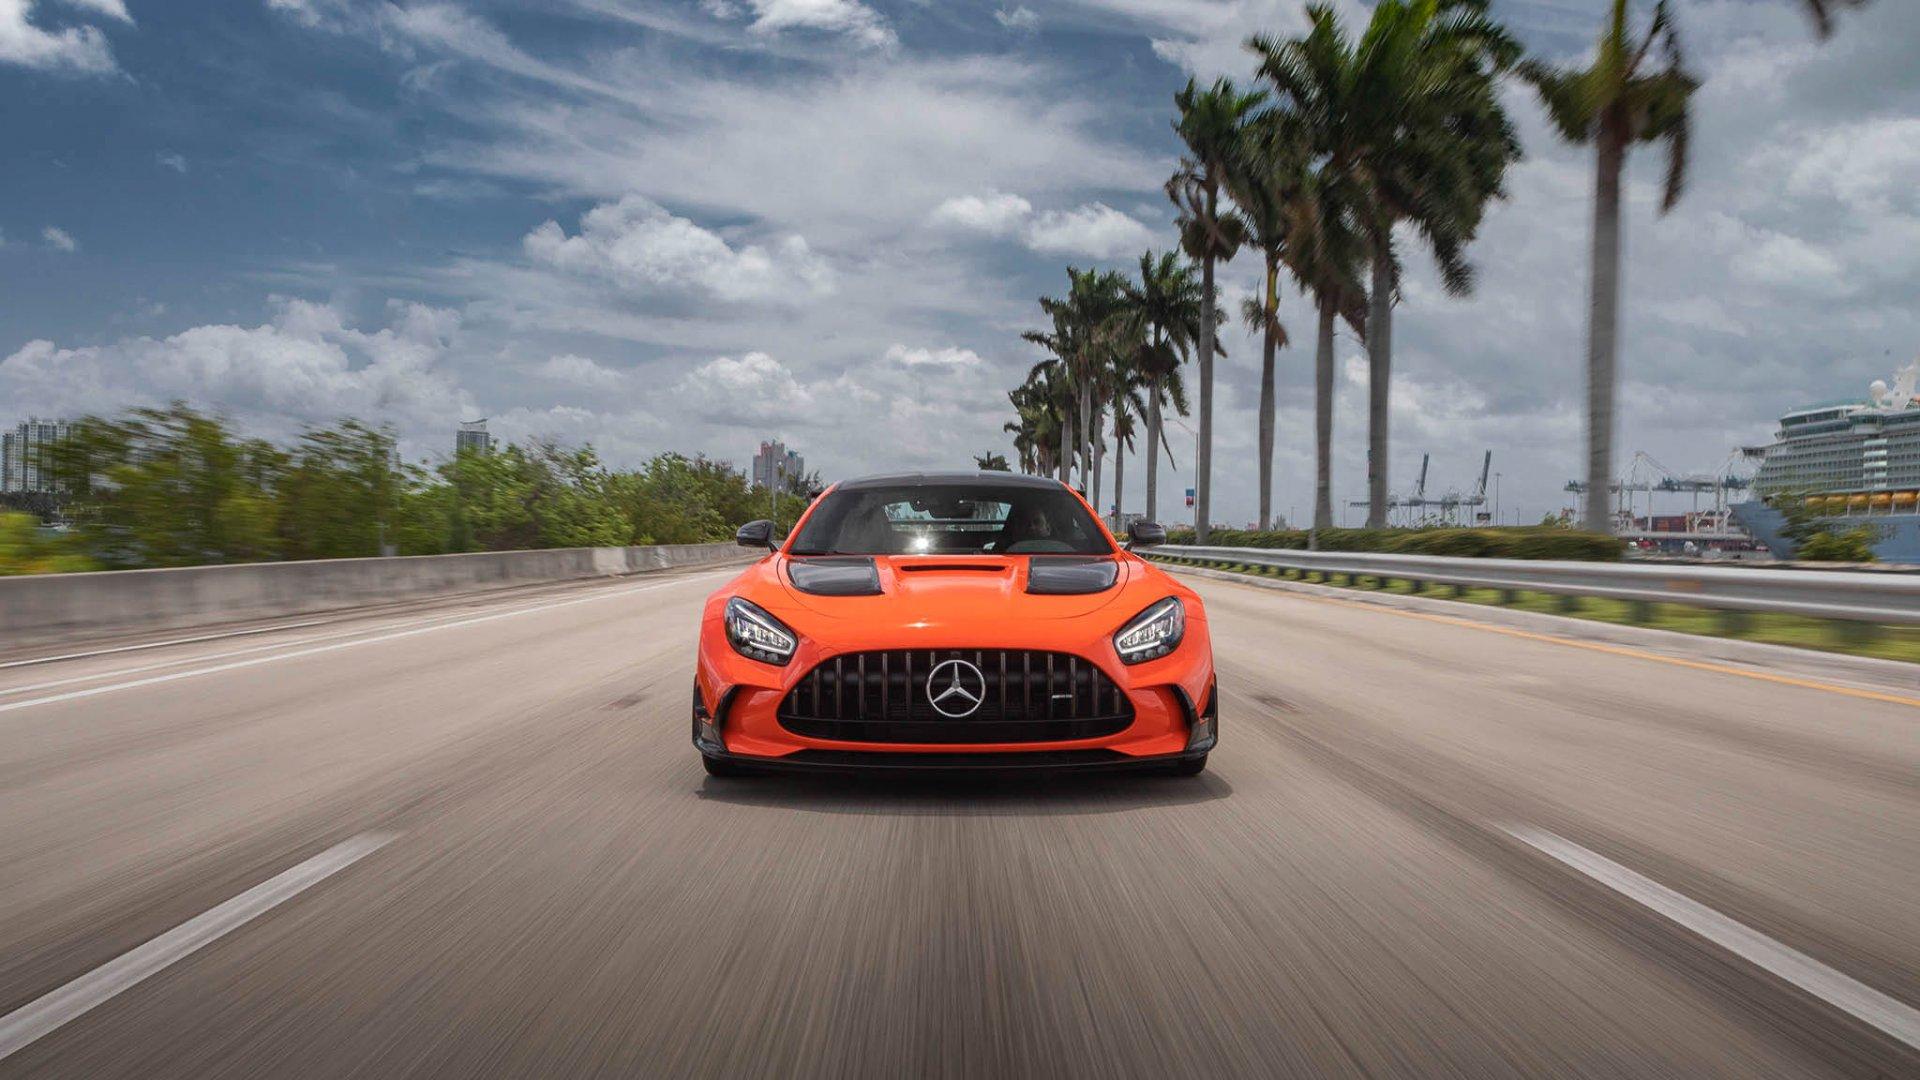 19 Mercedes-AMG on the Miami Autobahn_web_size.jpg